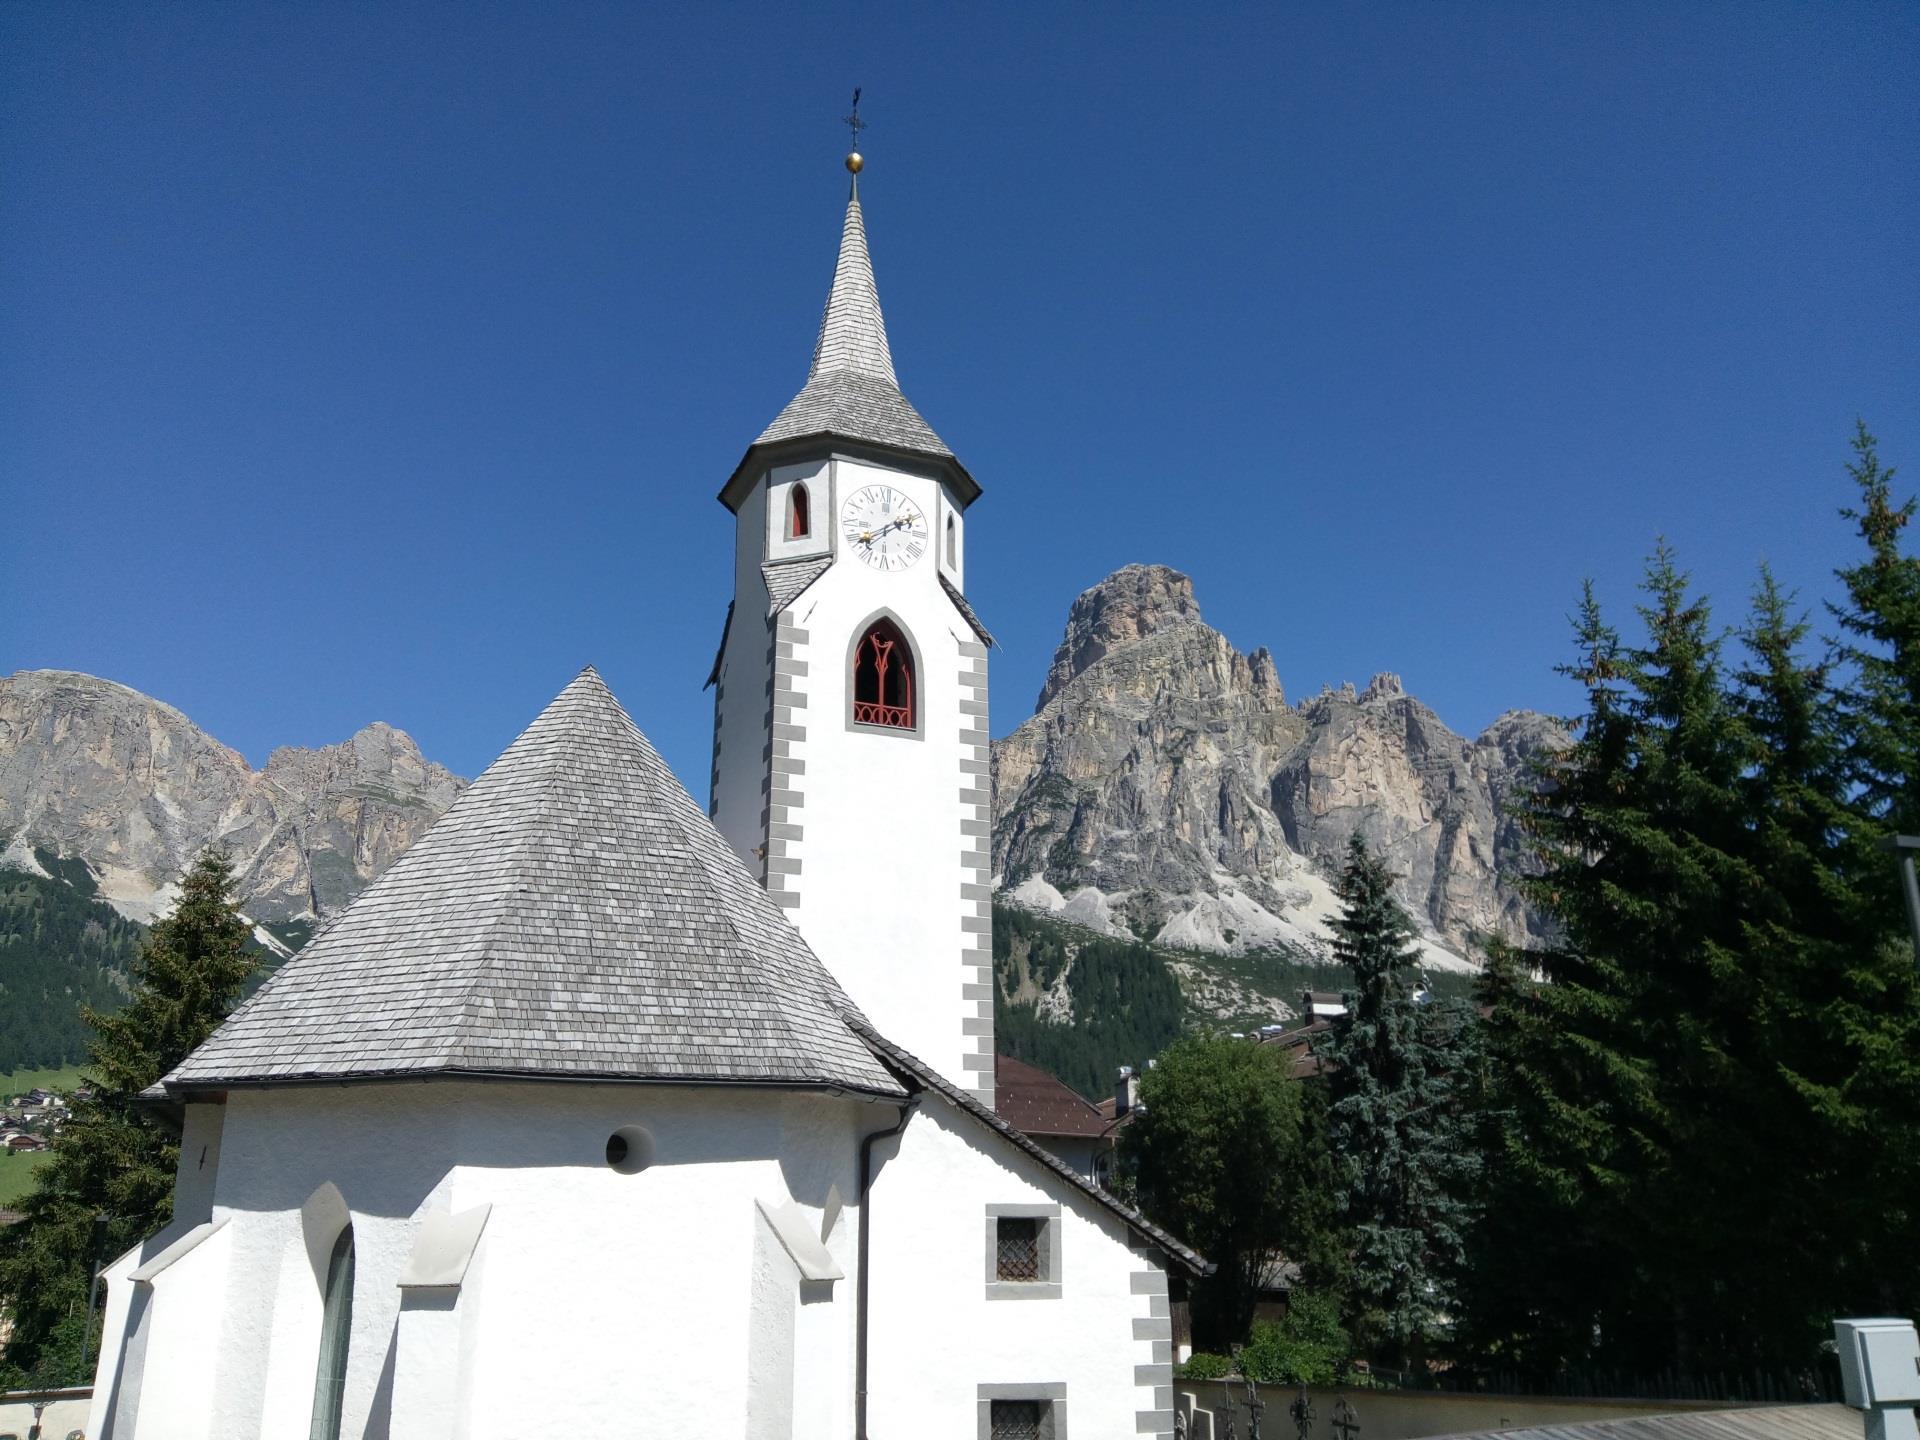 Die Kirche der Hl. Katharina in Corvara